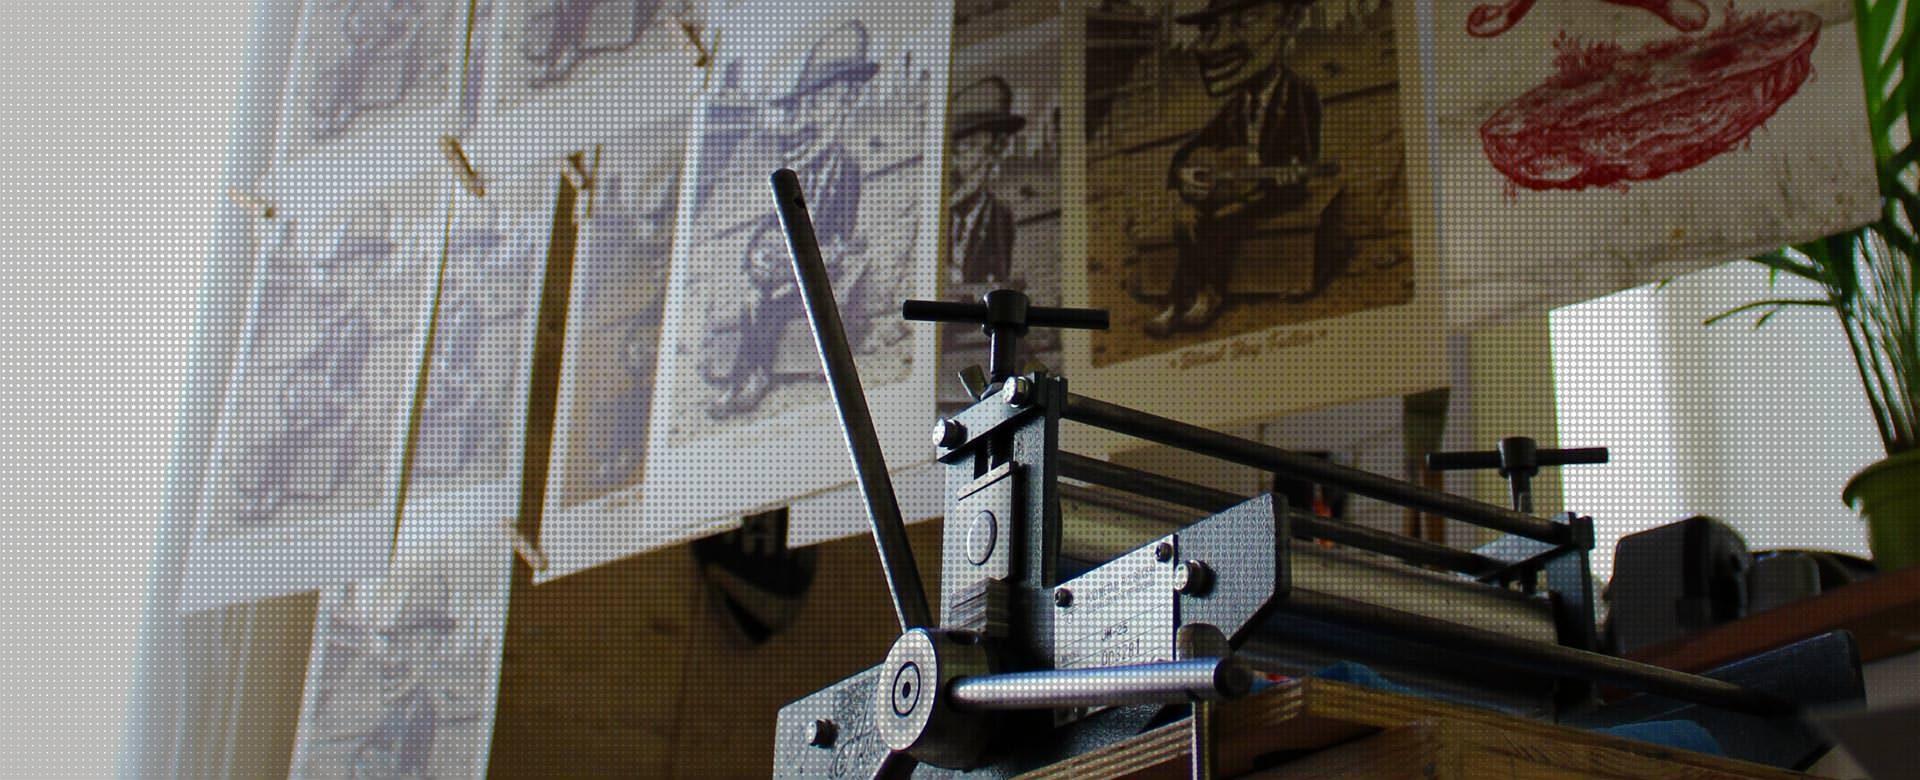 Spig Linocutfactory - Création graphique illustration - www.spig.fr